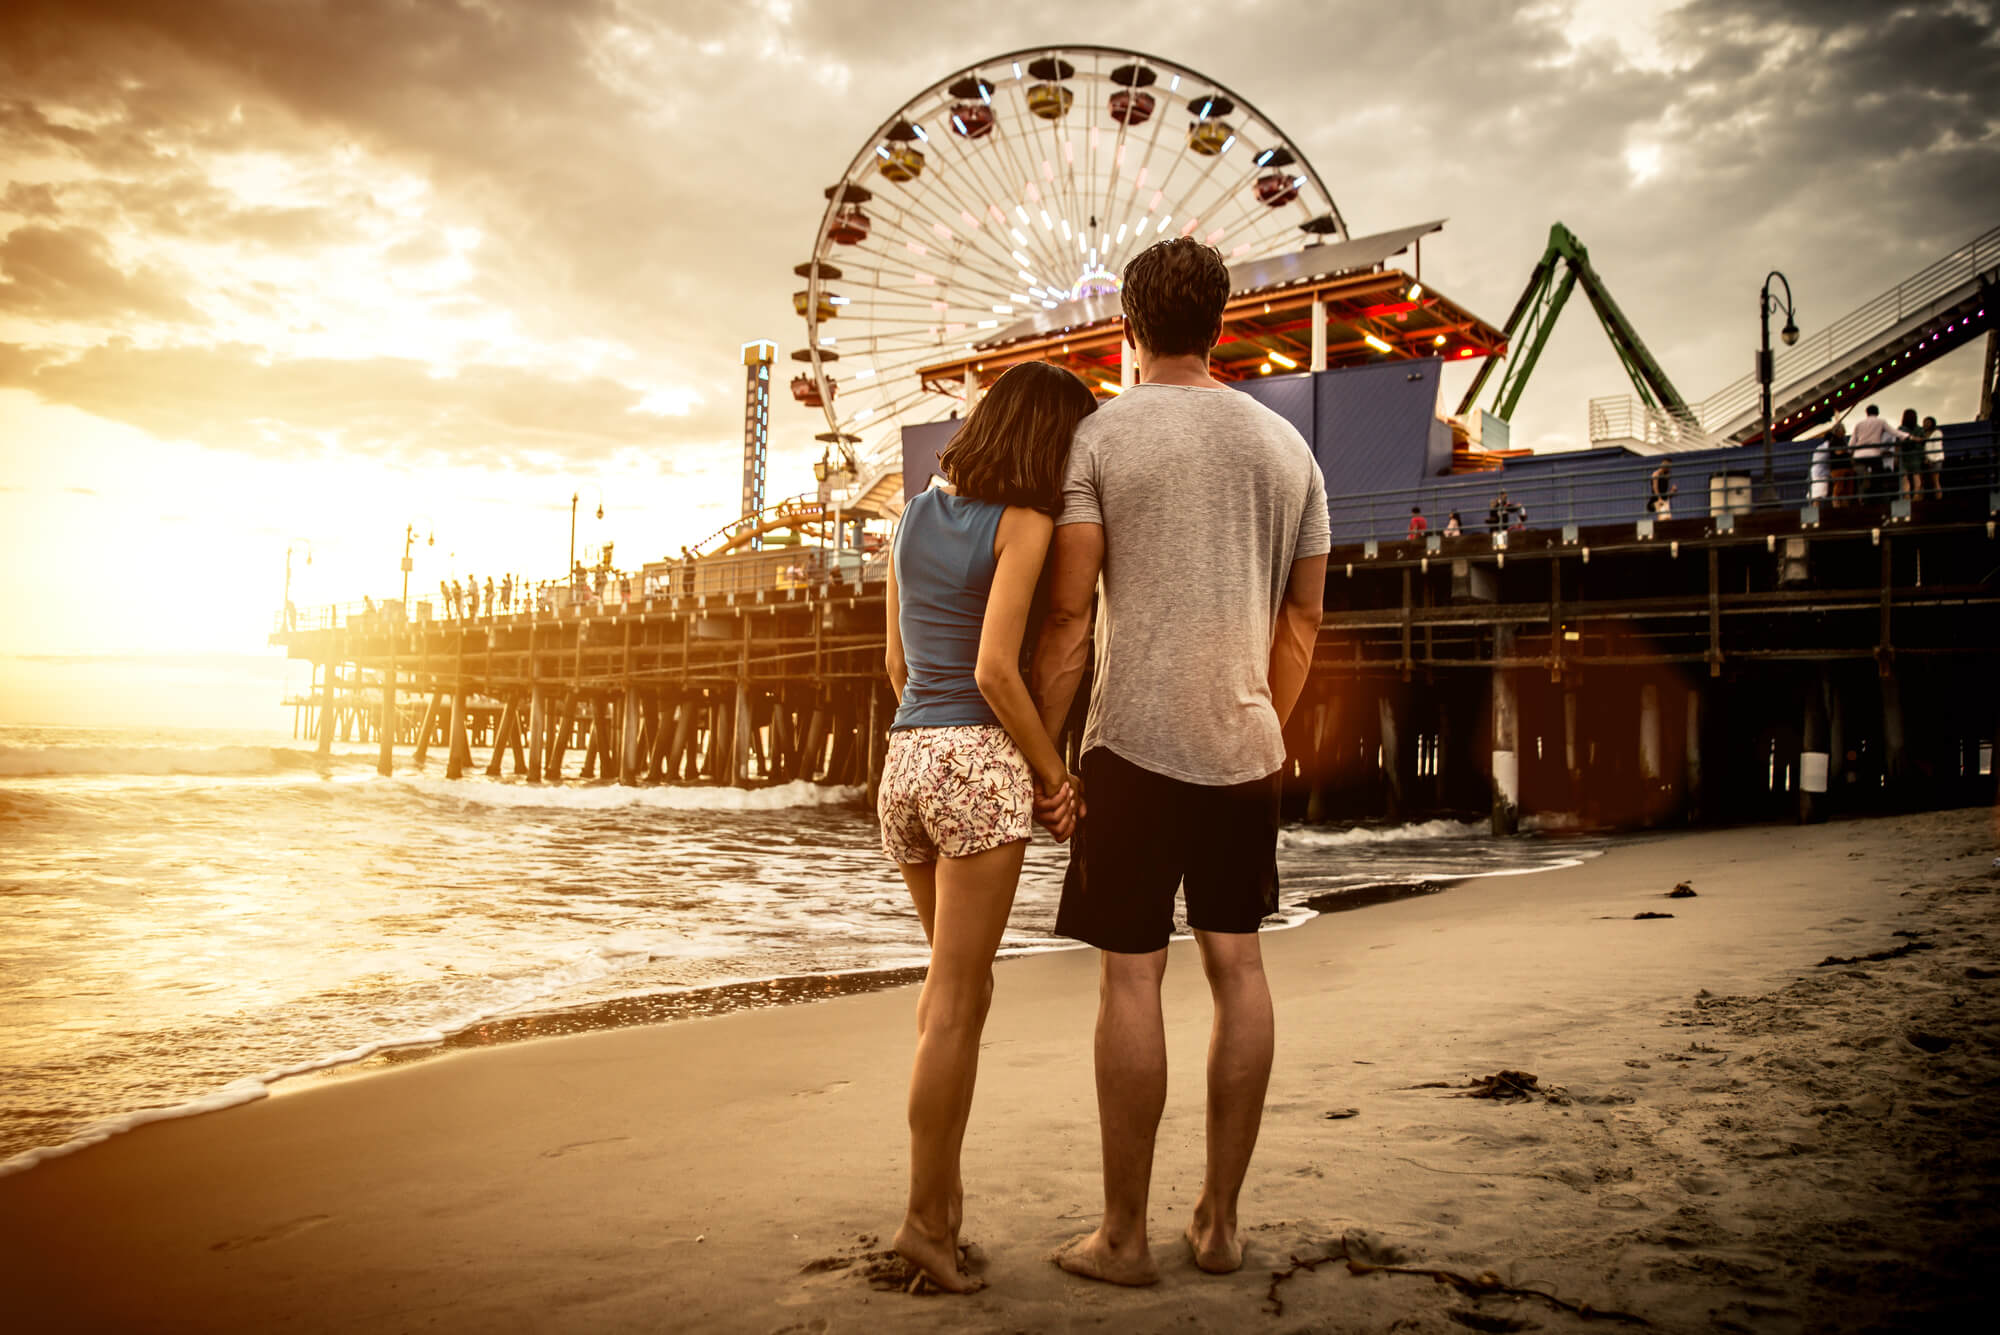 A couple on a California beach at sunset